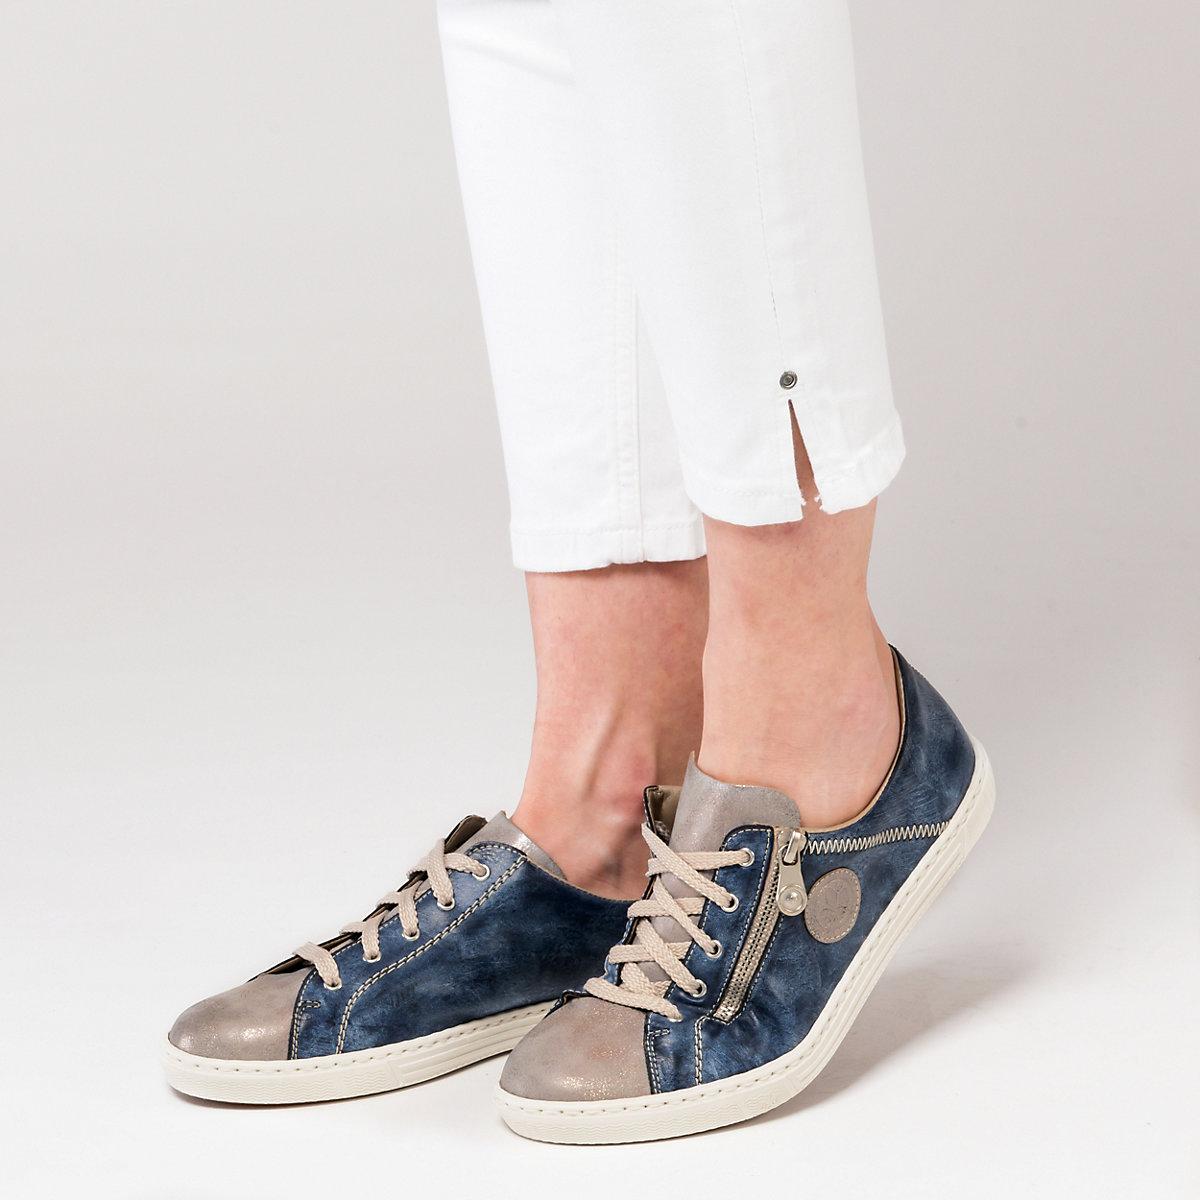 Rieker, Rieker Sneakers, Blau-kombi